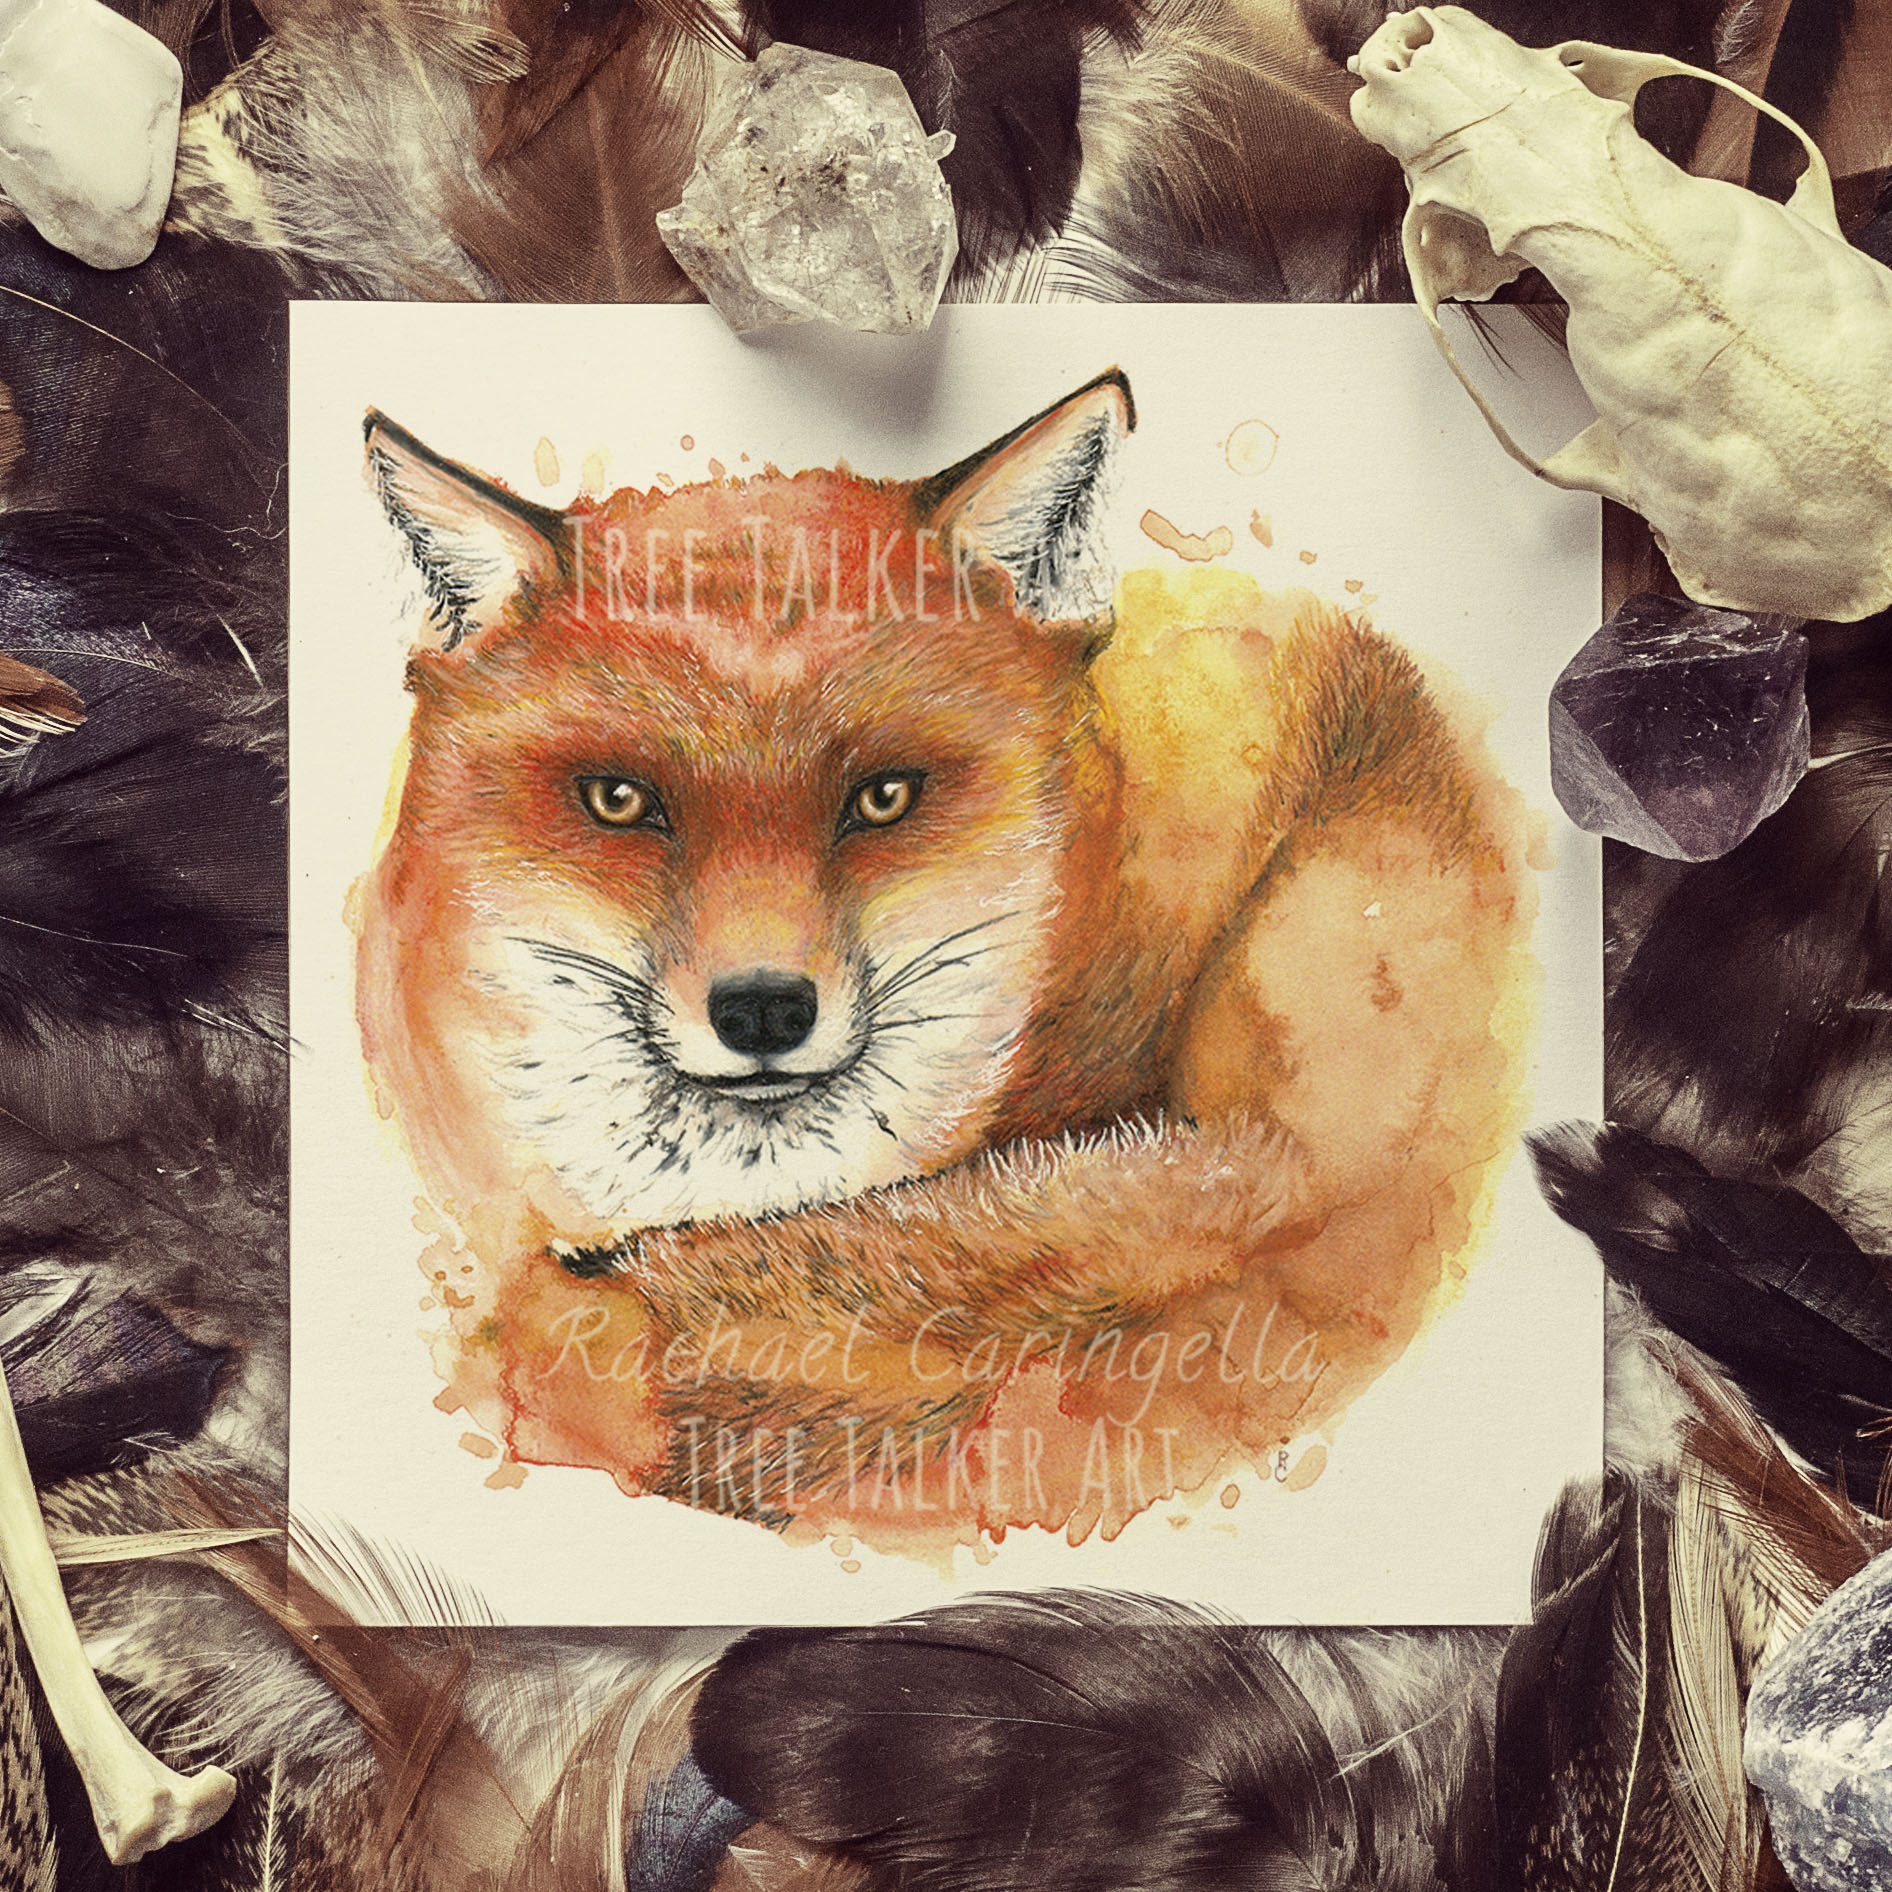 Fox Watercolor Mixed Media Painting   By Rachael Caringella   Tree Talker Art